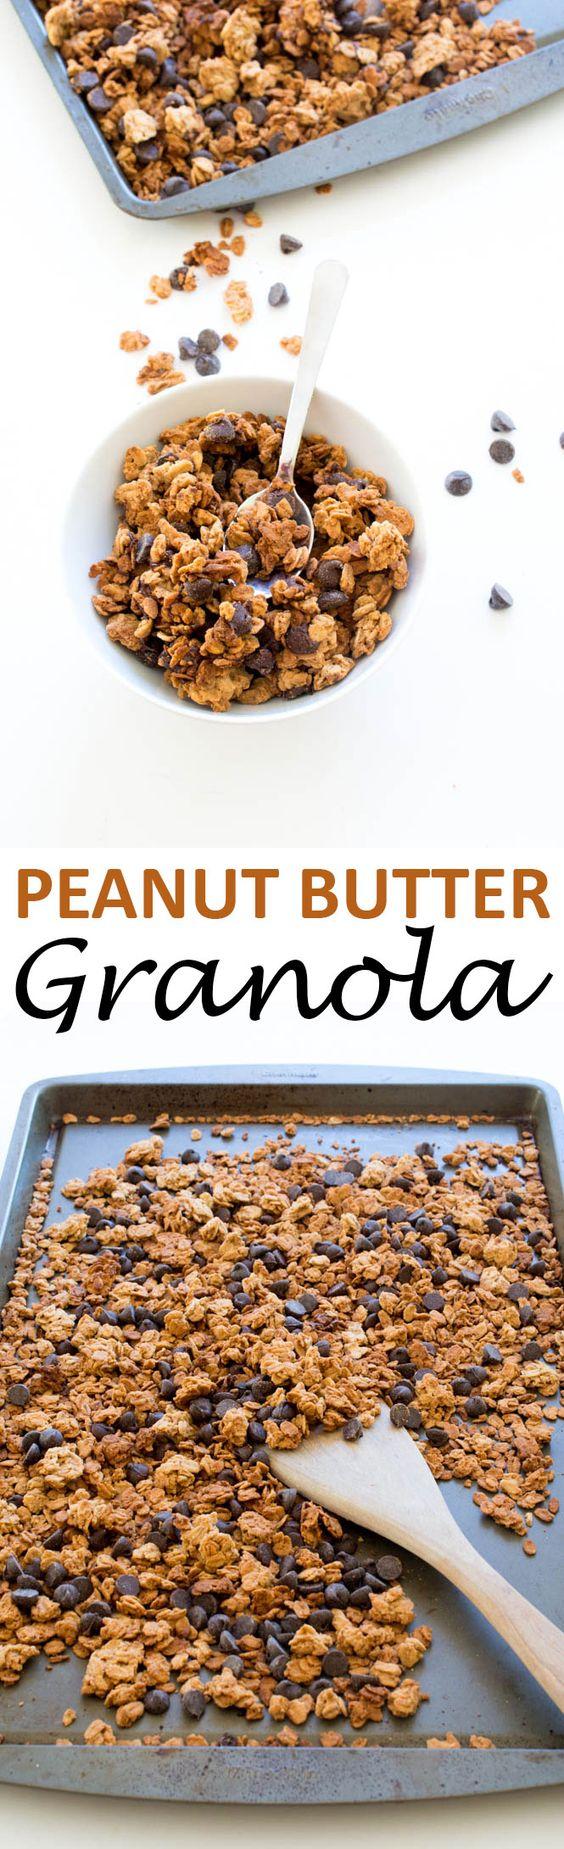 Peanut Butter Chocolate Chip Granola. Honey, oats, chocolate chips, and peanut butter.